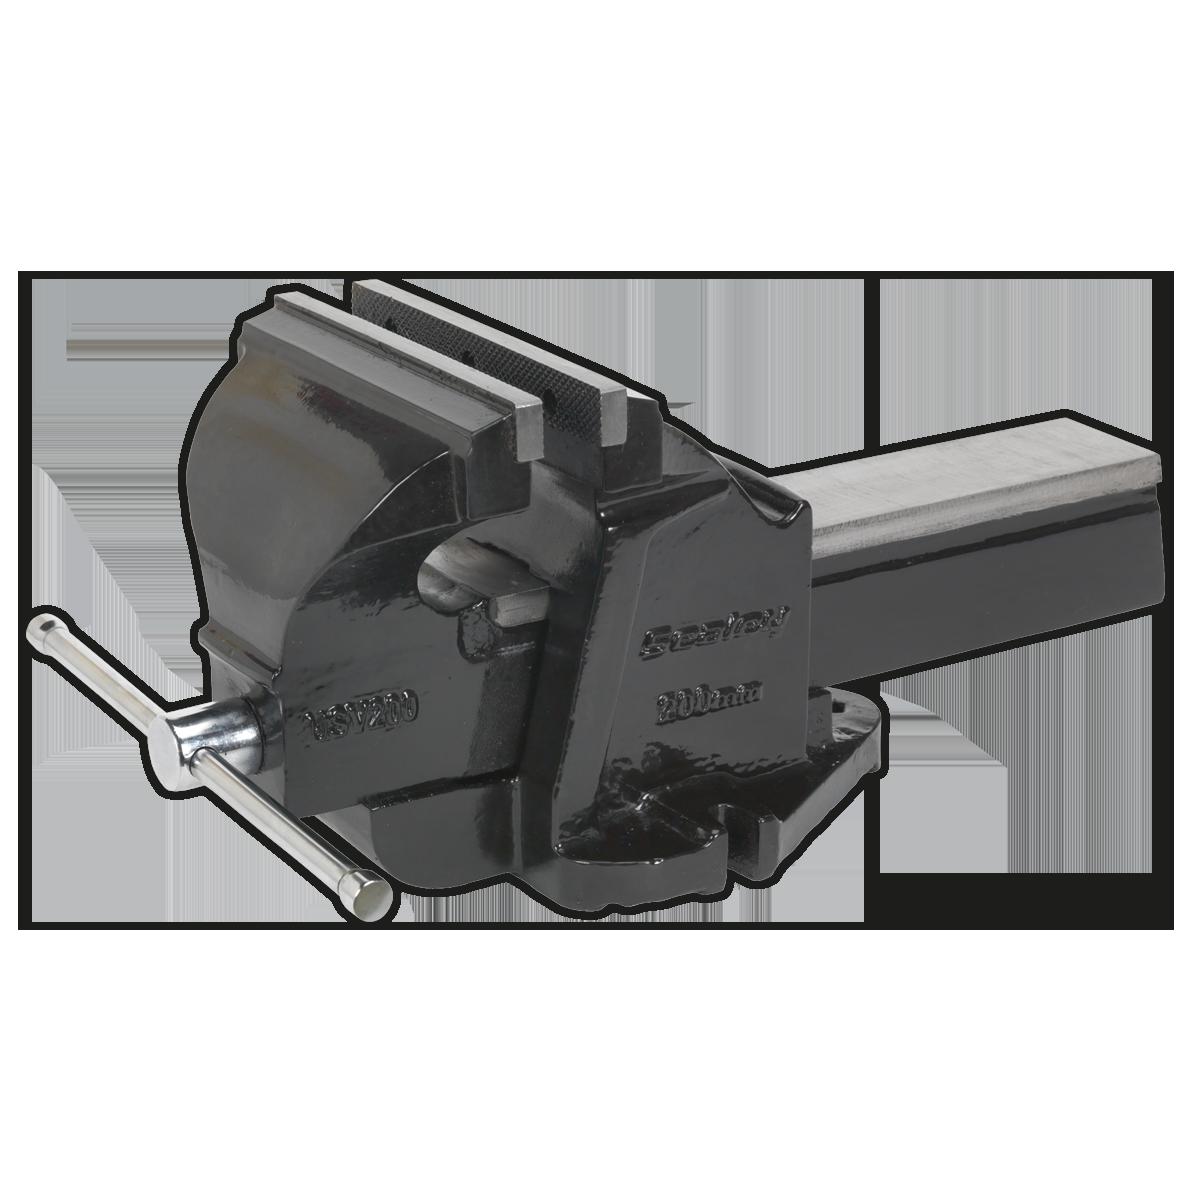 Sealey USV200 Professional Mechanic/'s Vice 200mm SG Iron